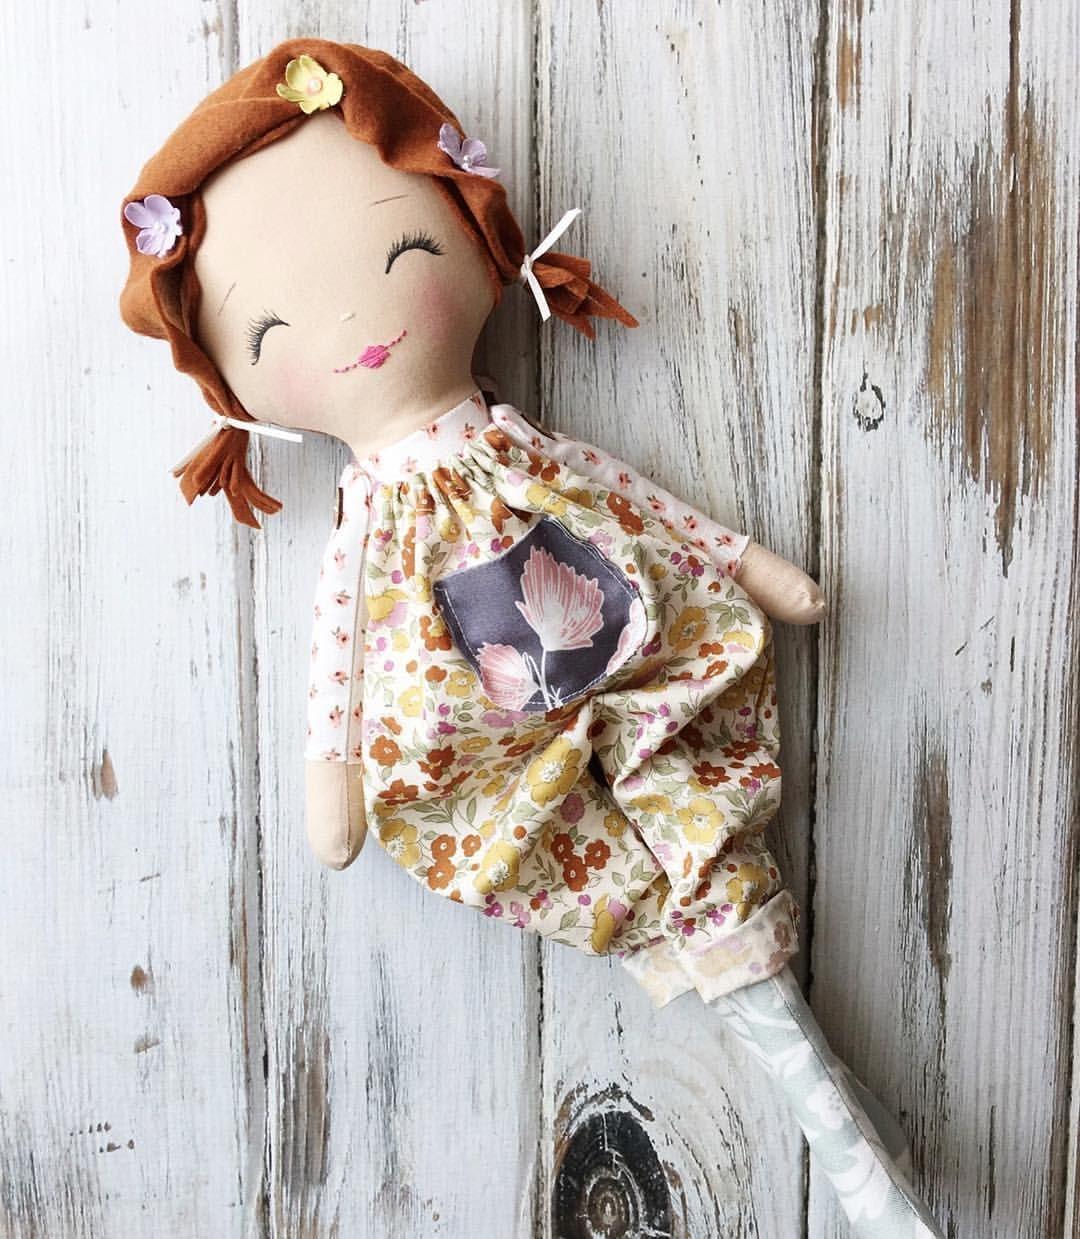 "Redhead Doll by SpunCandy - SpunCandy Dolls ~ Omaha, NE (@spuncandydolls) on Instagram: ""Sweet Lil Red ❤ #spuncandydolls #clothdoll #handmadedoll #littlewanderer #redhead #ginger…"""